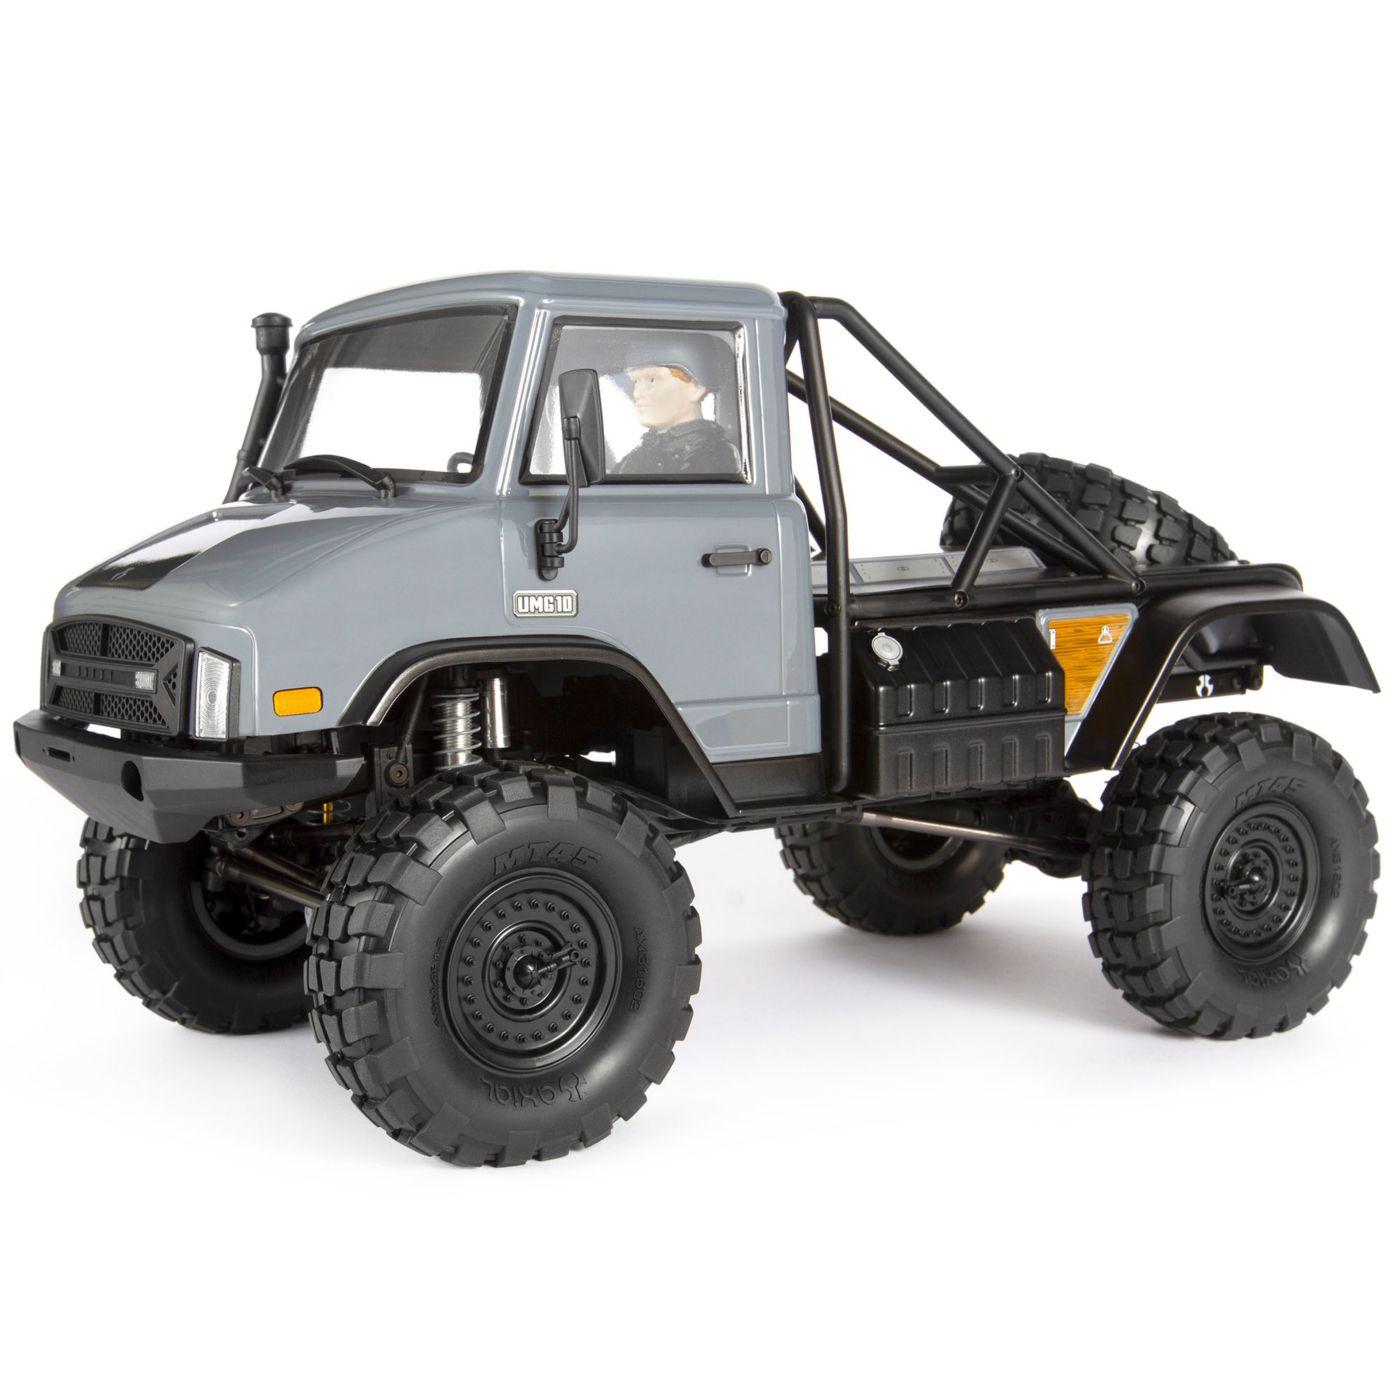 Axial SCX10 II UMG10 R/C Crawler Kit